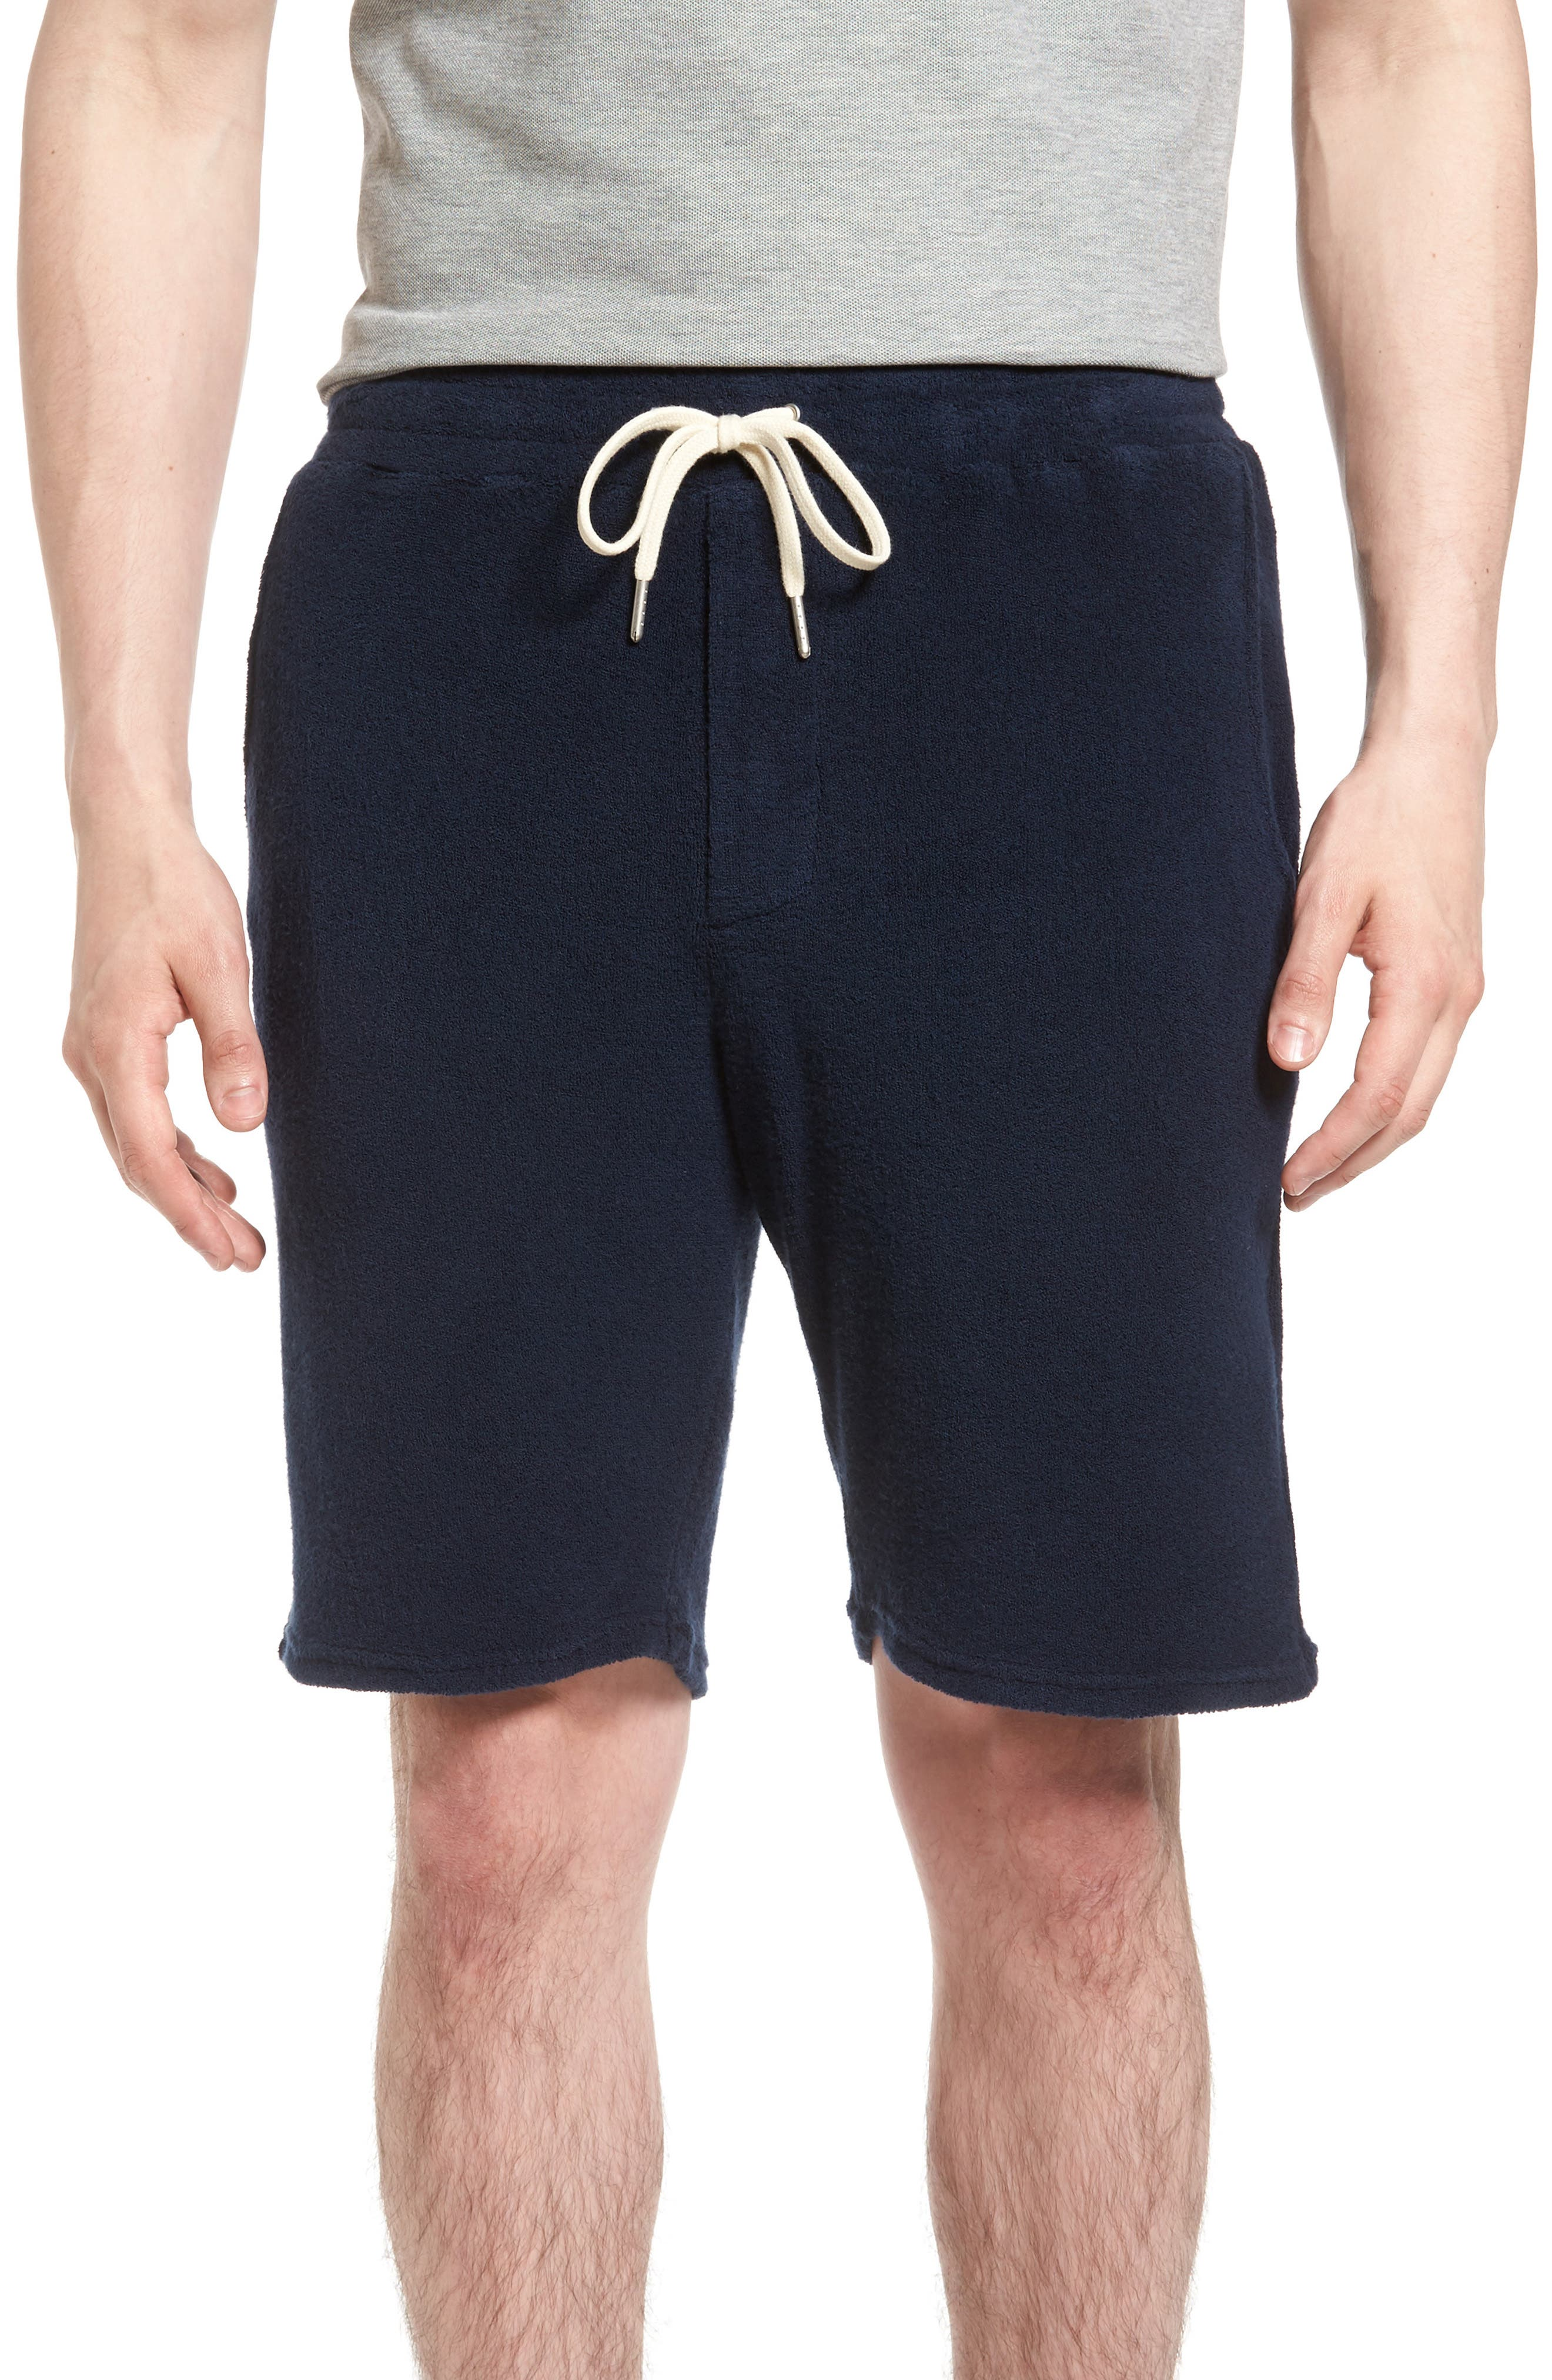 bonobos terry cloth sweat shorts nordstrom